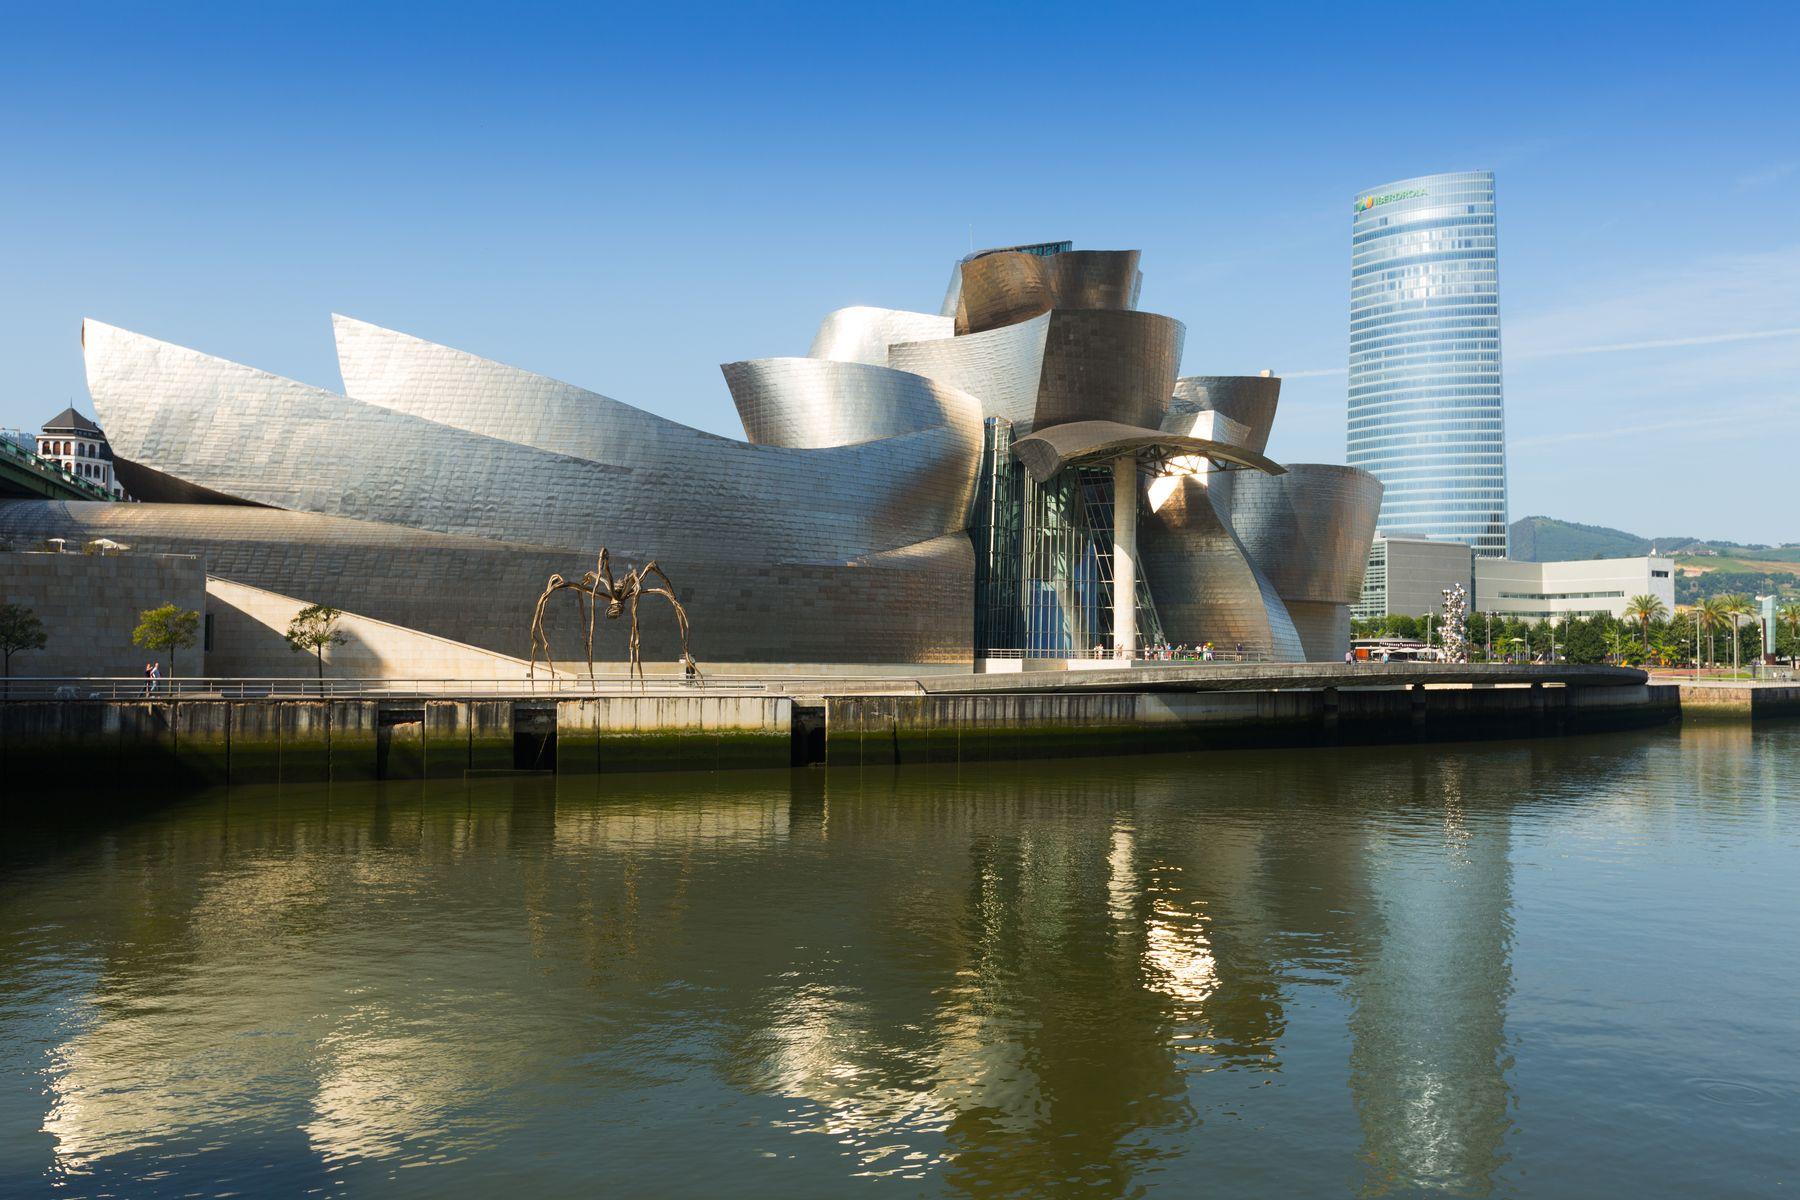 Museo Guggenheim (Bilbao, Spagna)